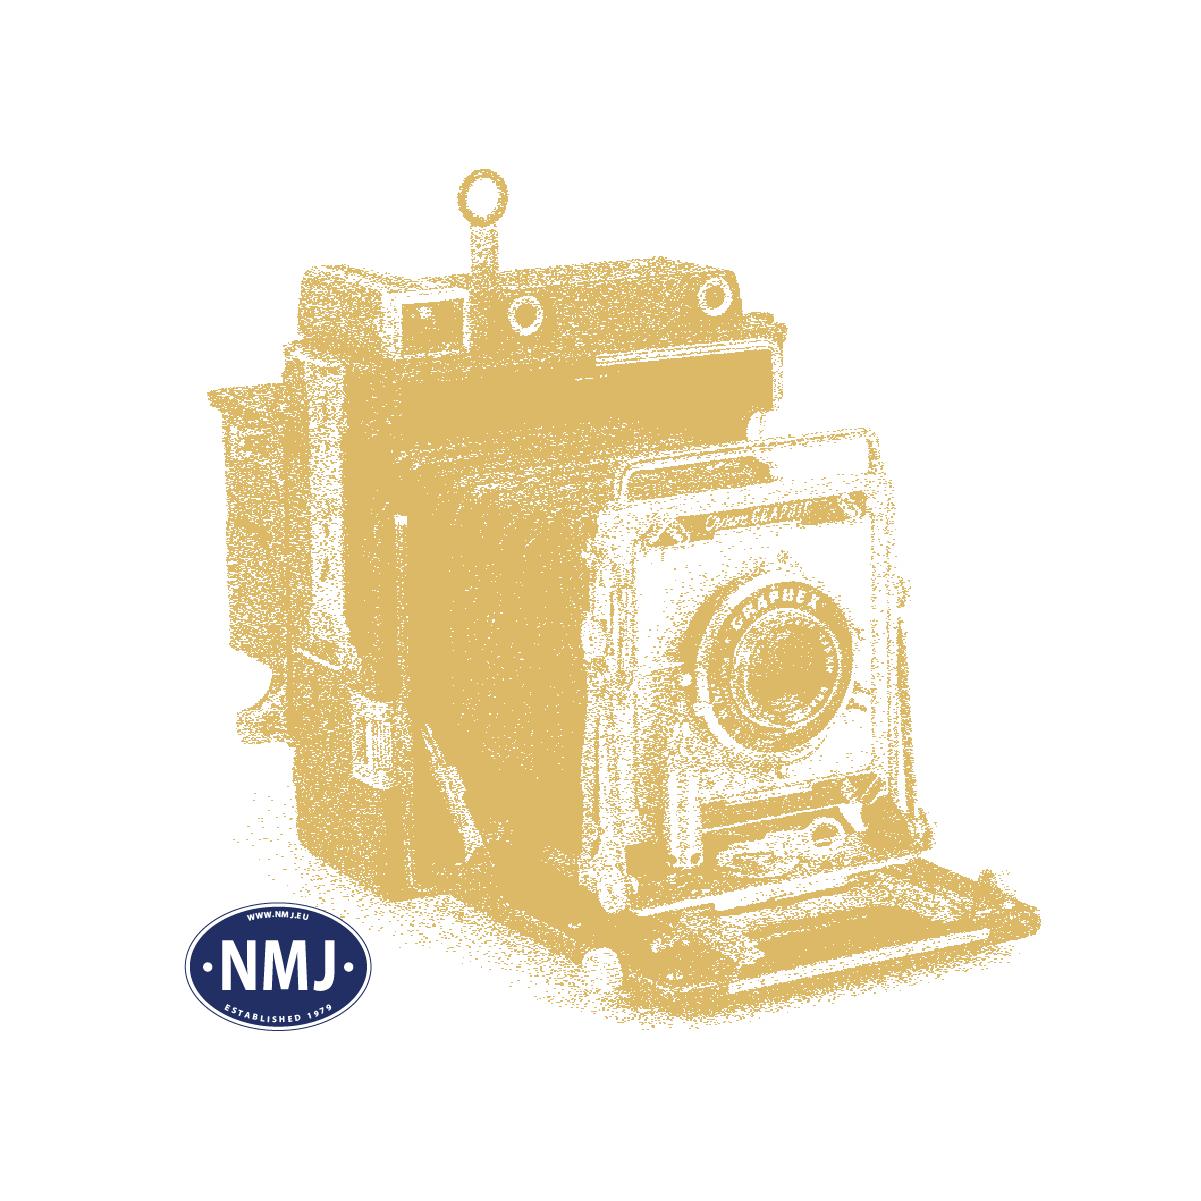 NMJT83.990 - NMJ Topline SKD224 main PCB w/ Decoder, Capacitor & Wheels